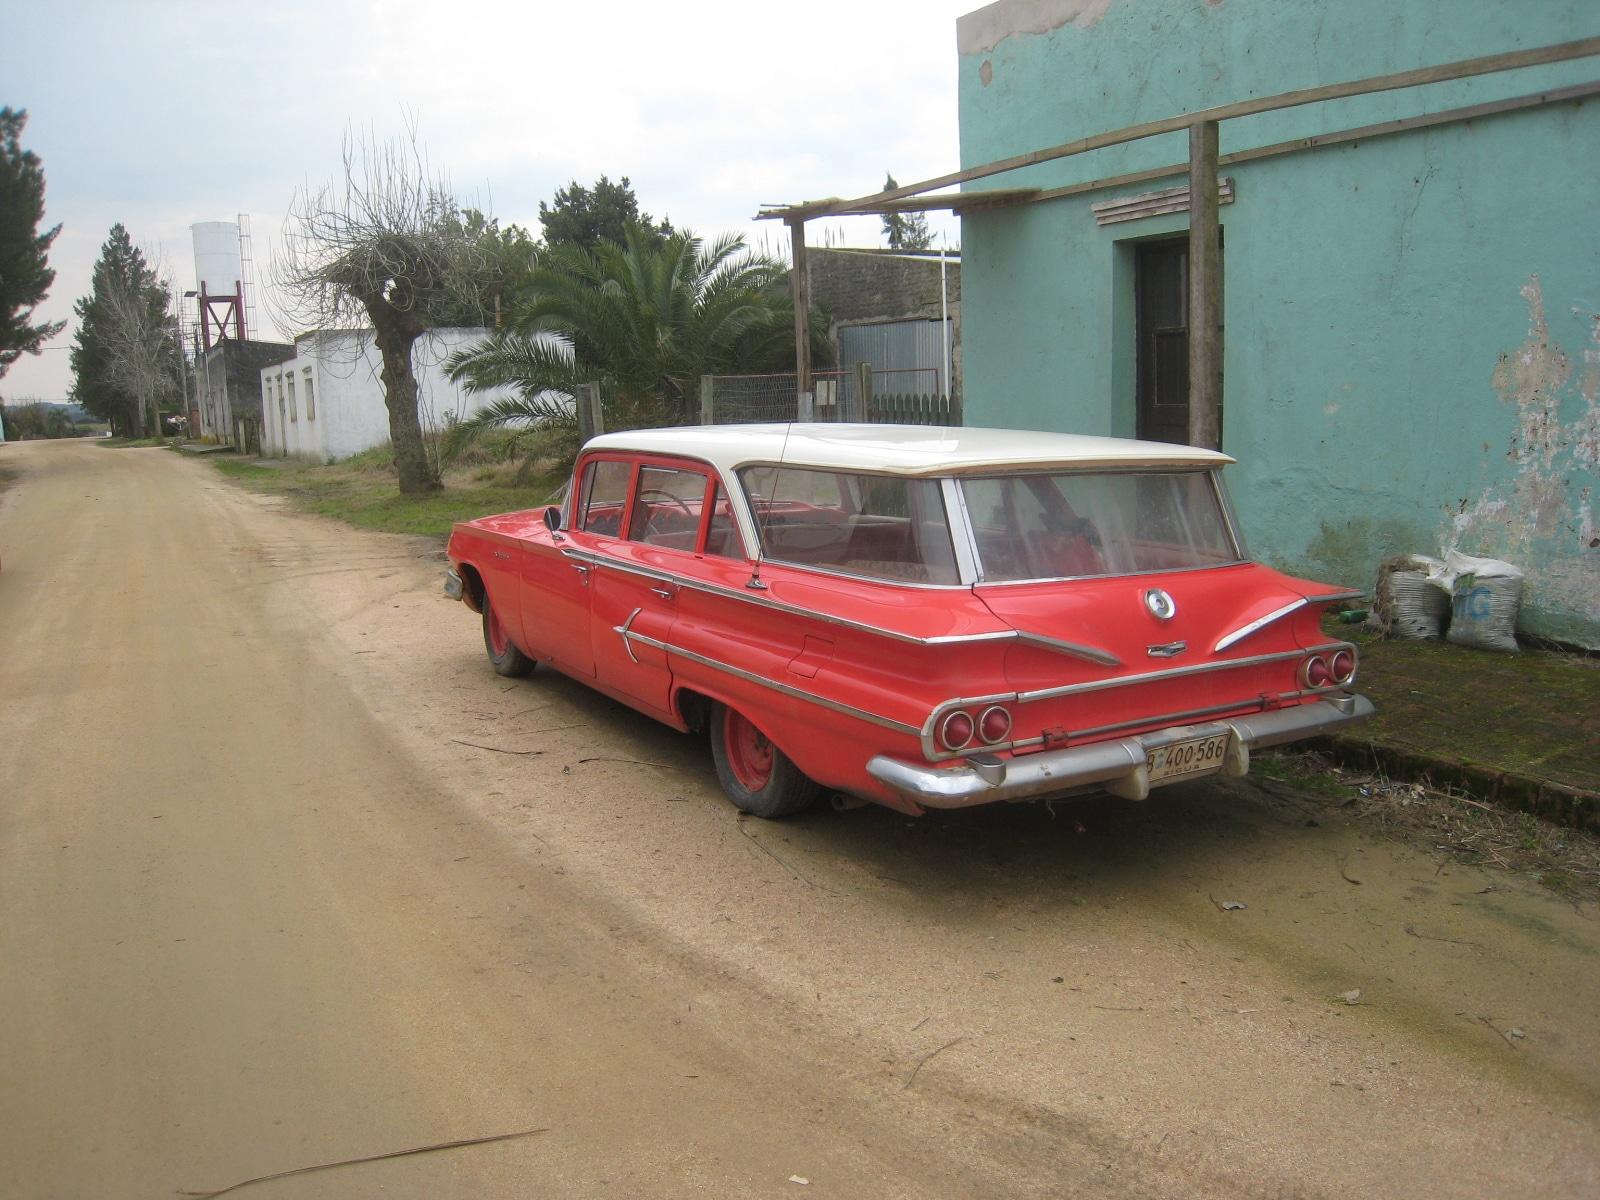 Antique Cars in Pueblo Garzon